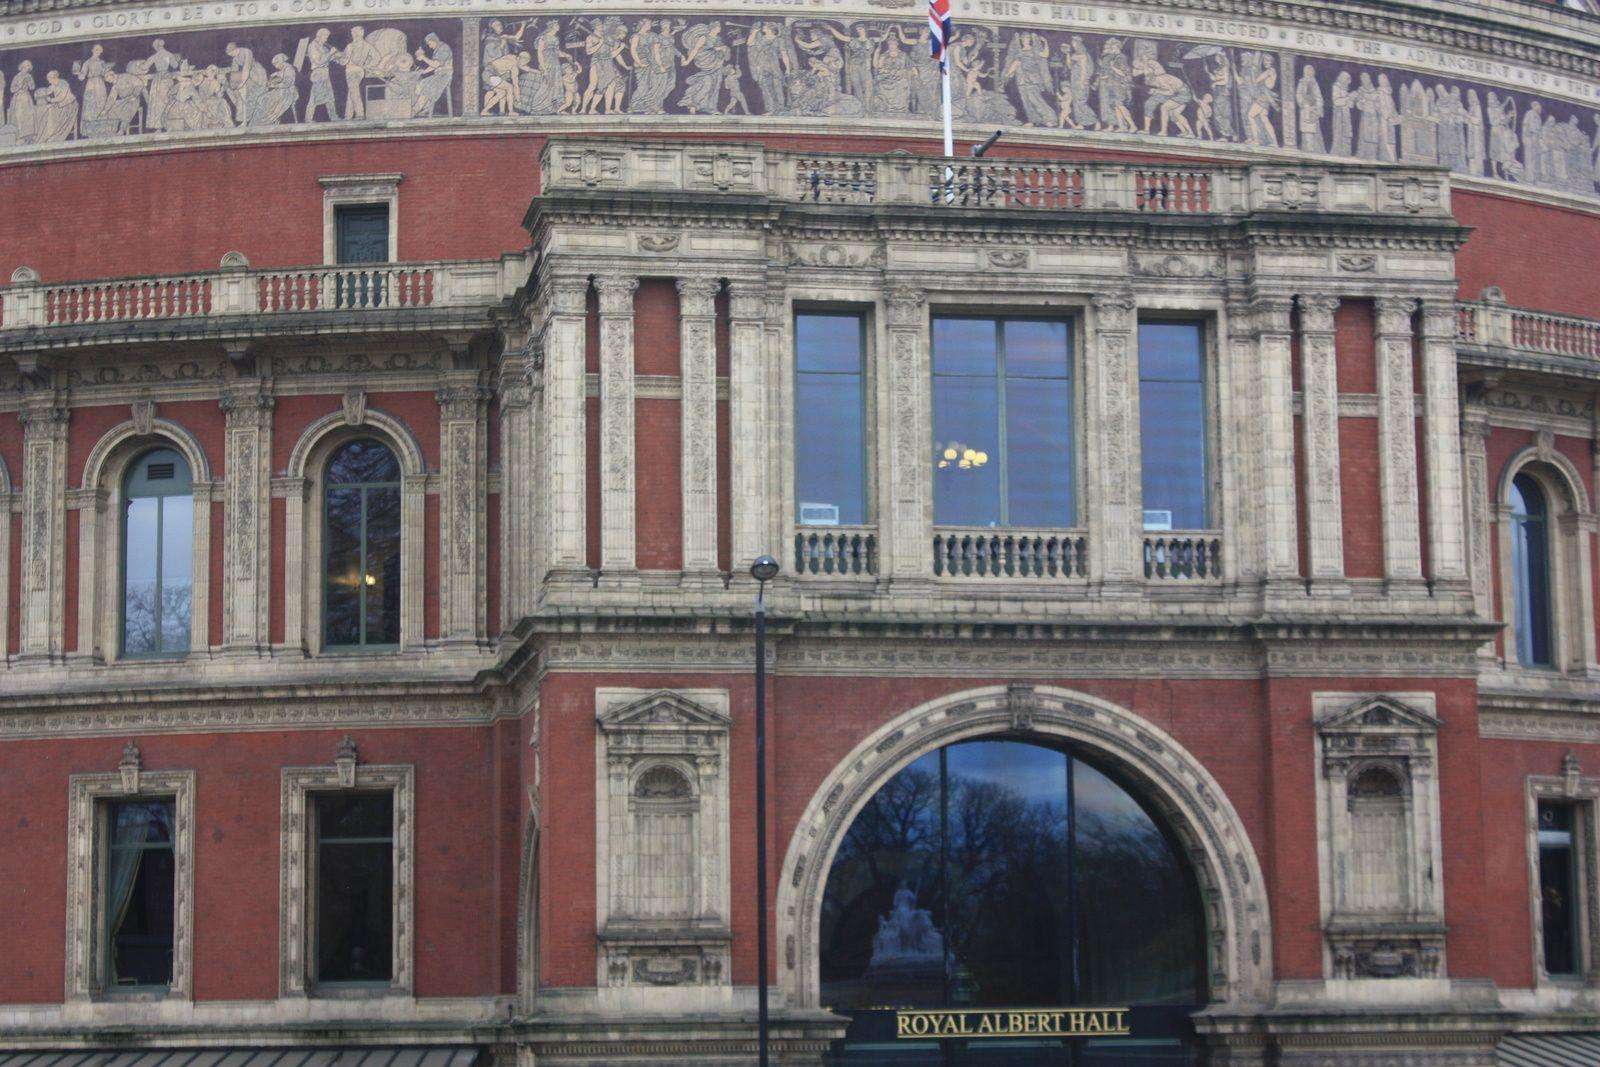 Science Museum / Royal Albert Hall / Albert Memorial / Hyde Park / Harrod's